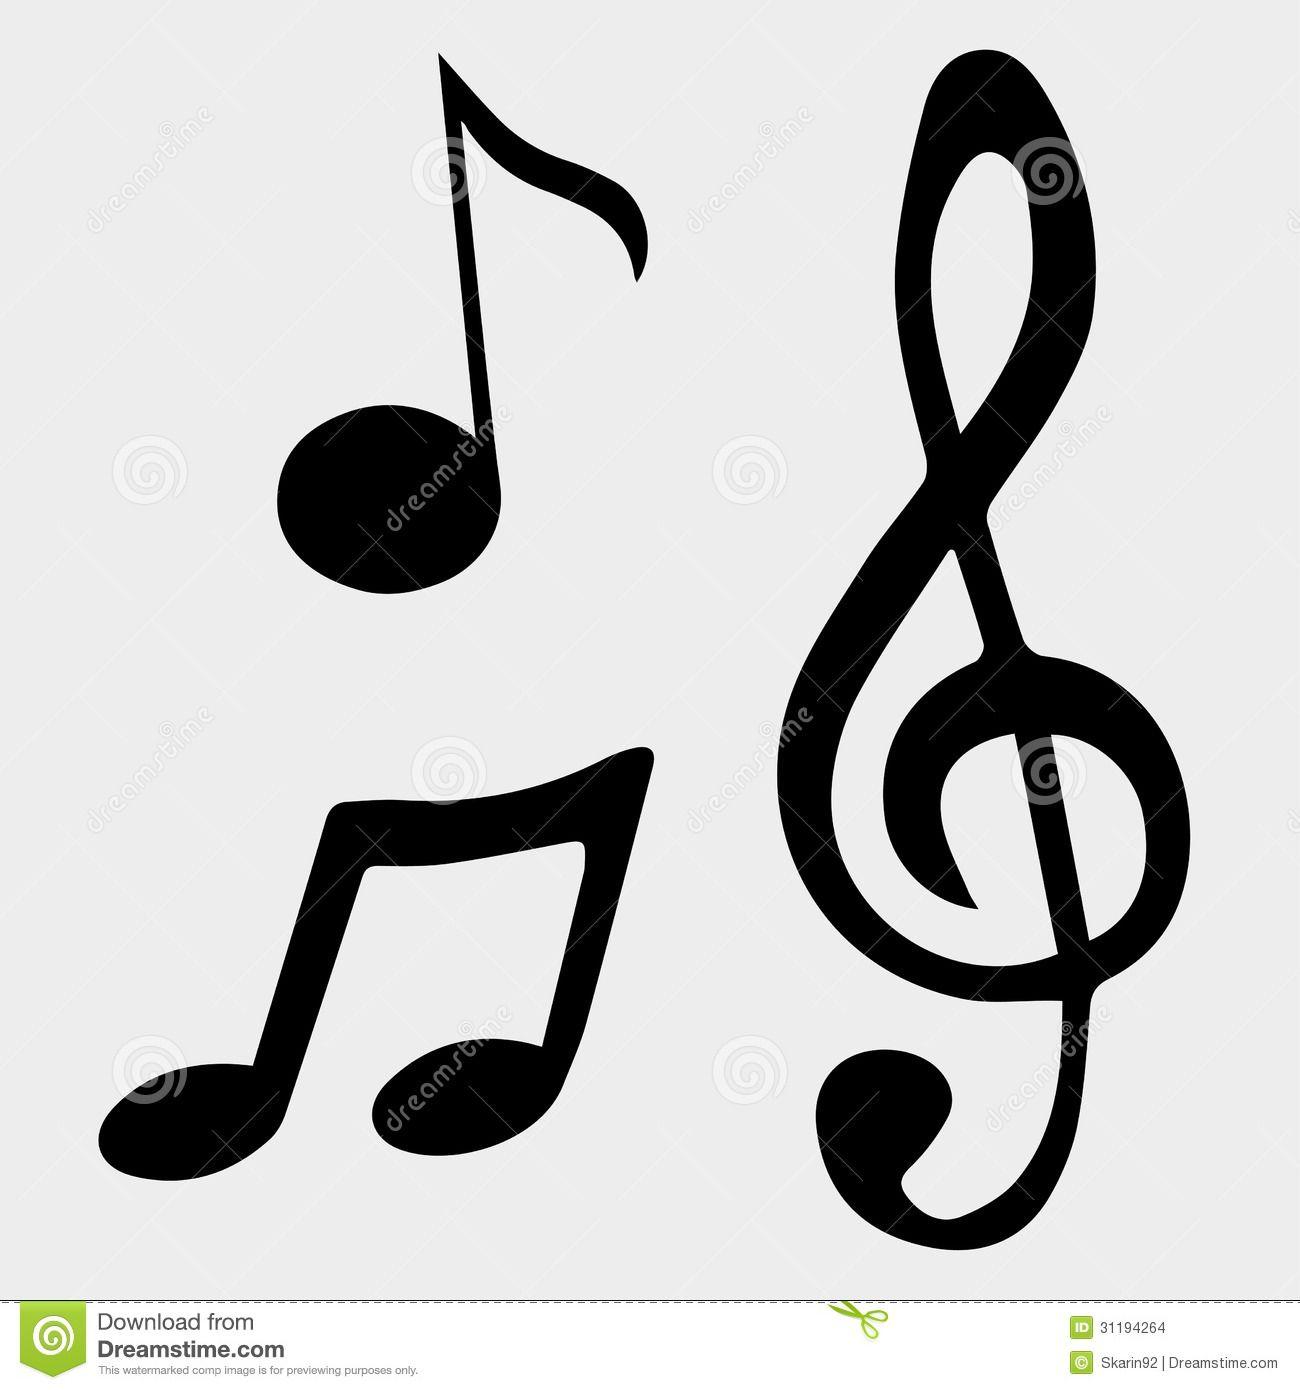 Vector Music Notes Symbols #sigilaffirmations | Music ...